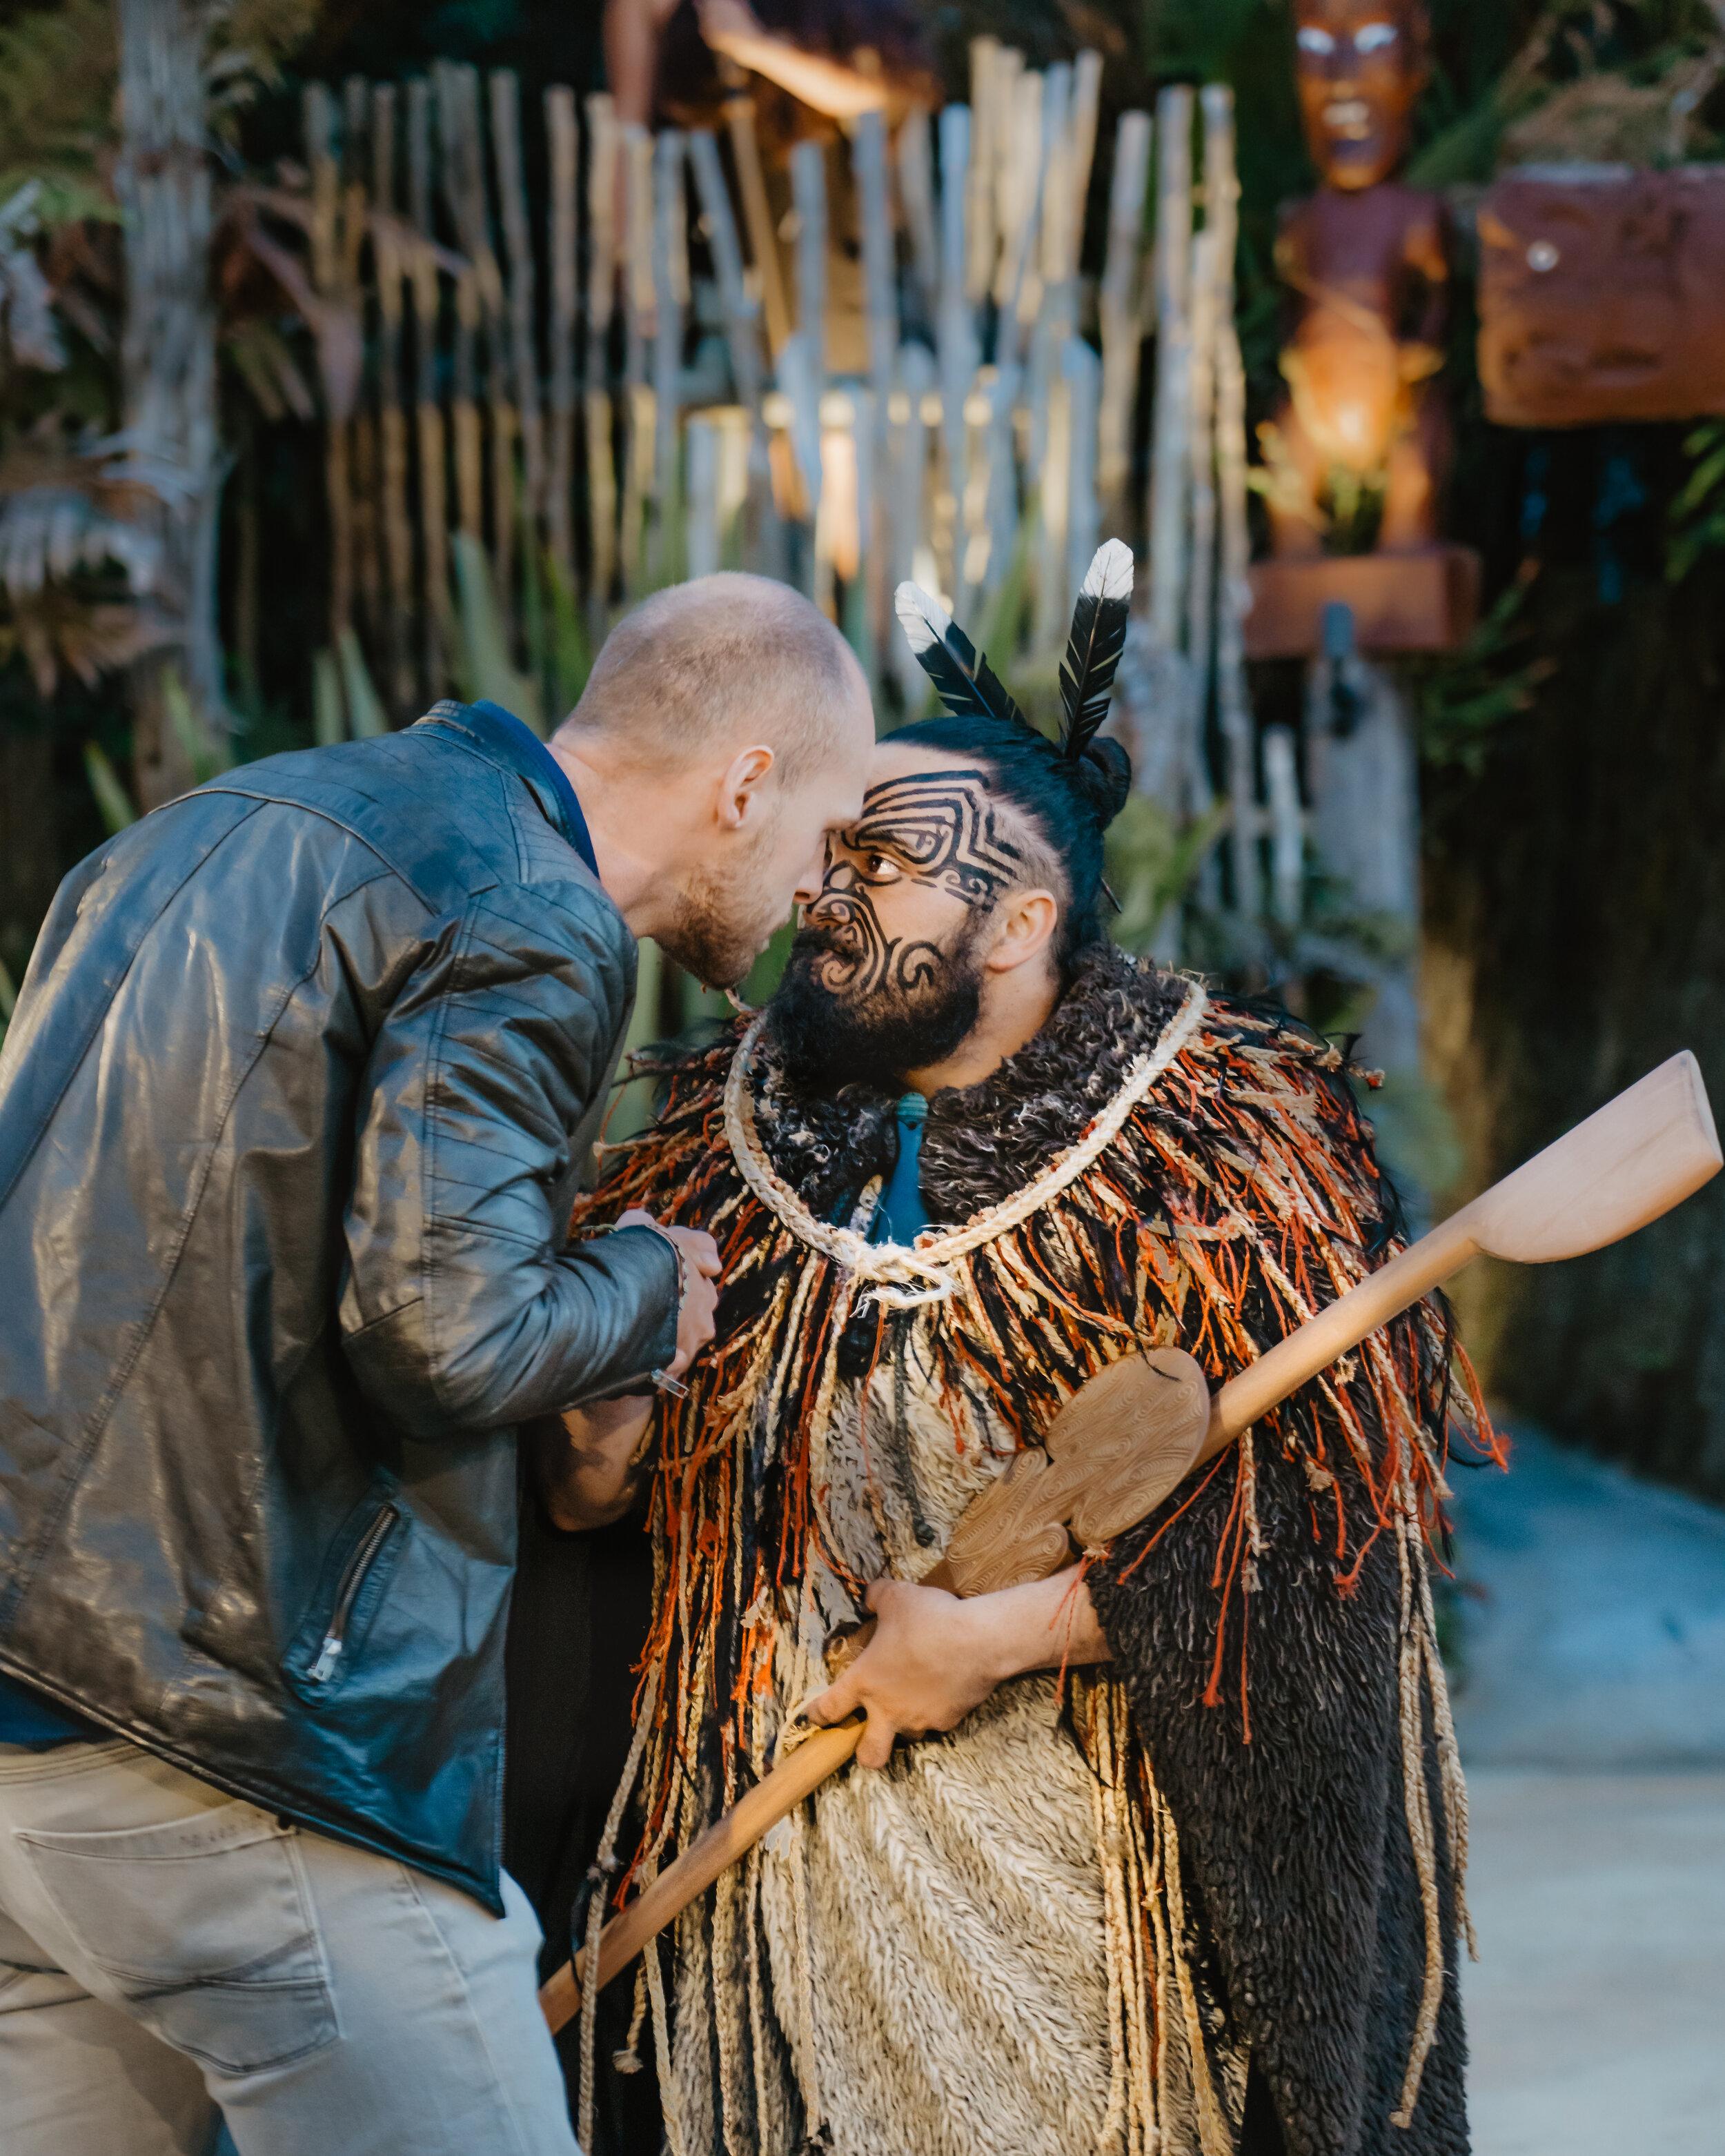 Tom and maori chief what to do rotorua New Zealand